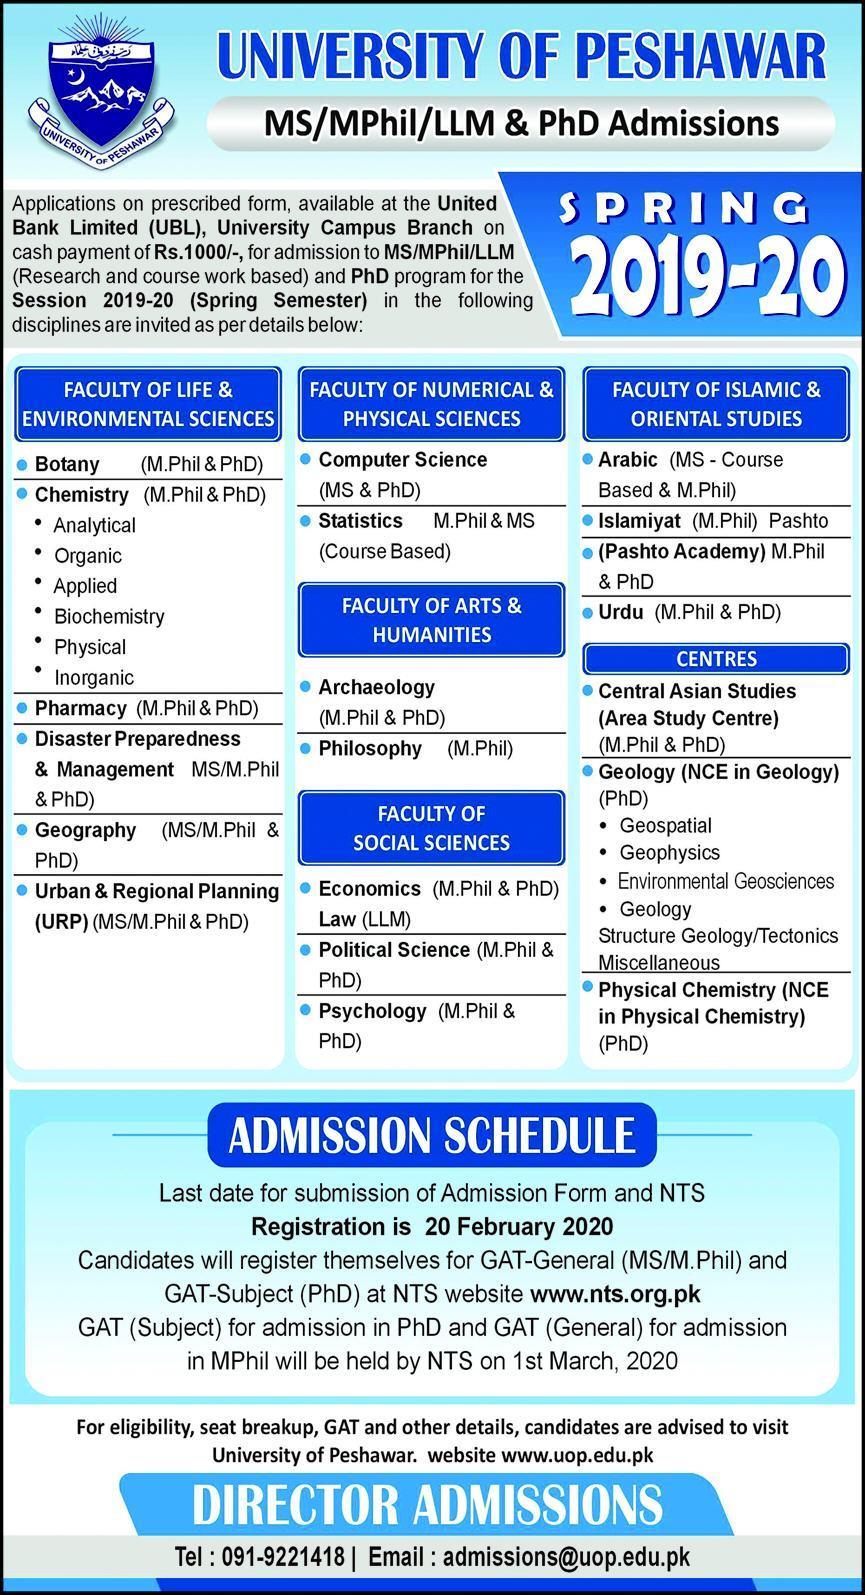 University Of Peshawar Admissions